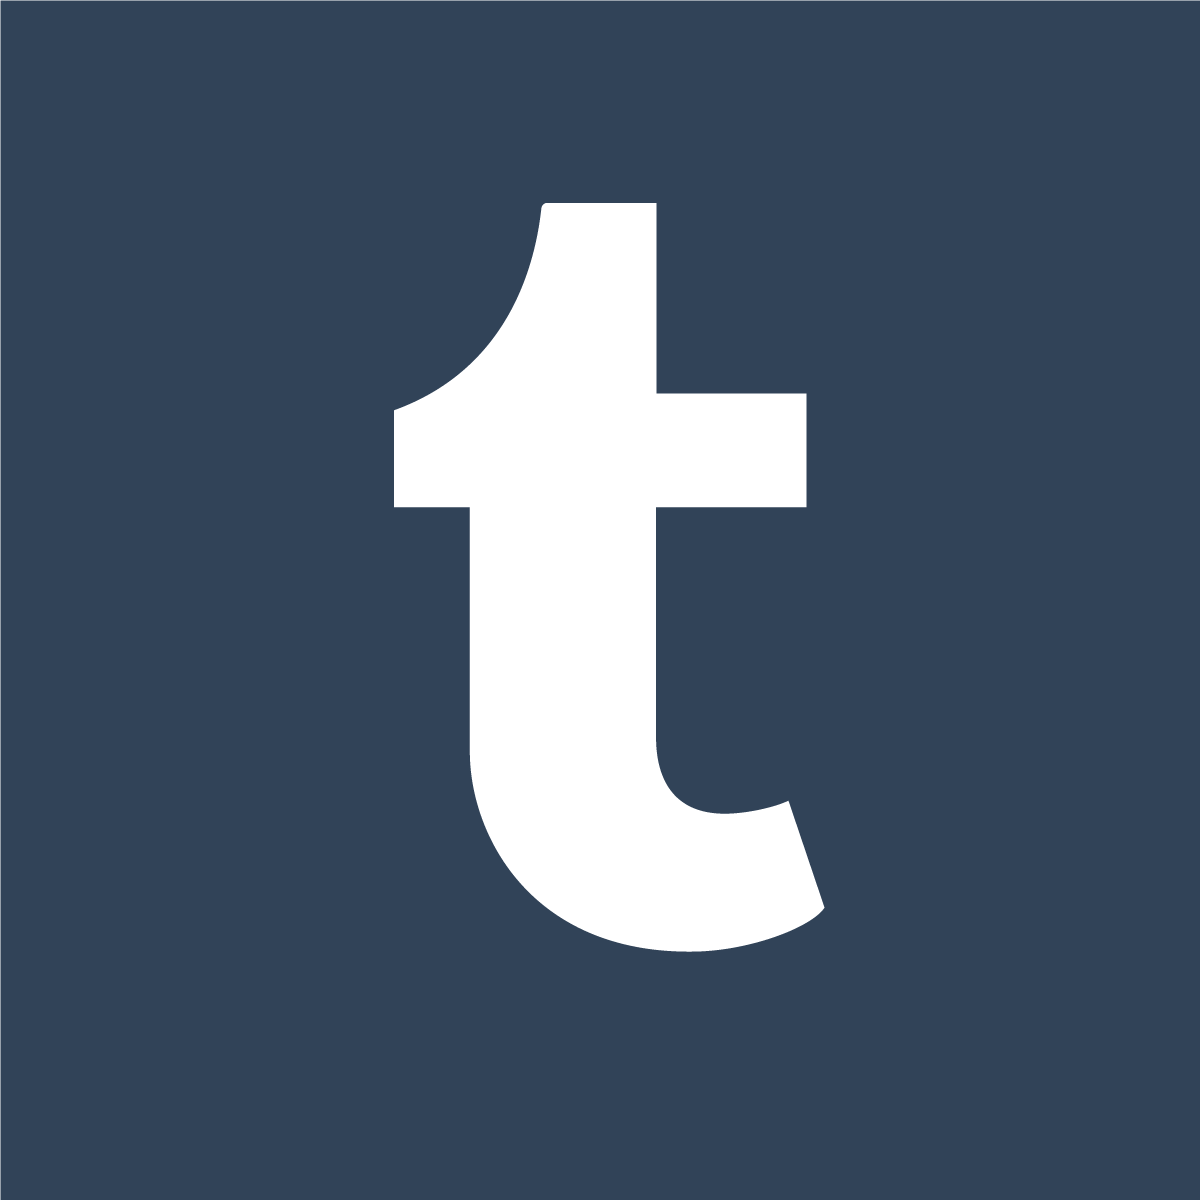 1200x1200 Tumblr Square Icon Logo Vector Free Vector Silhouette Graphics